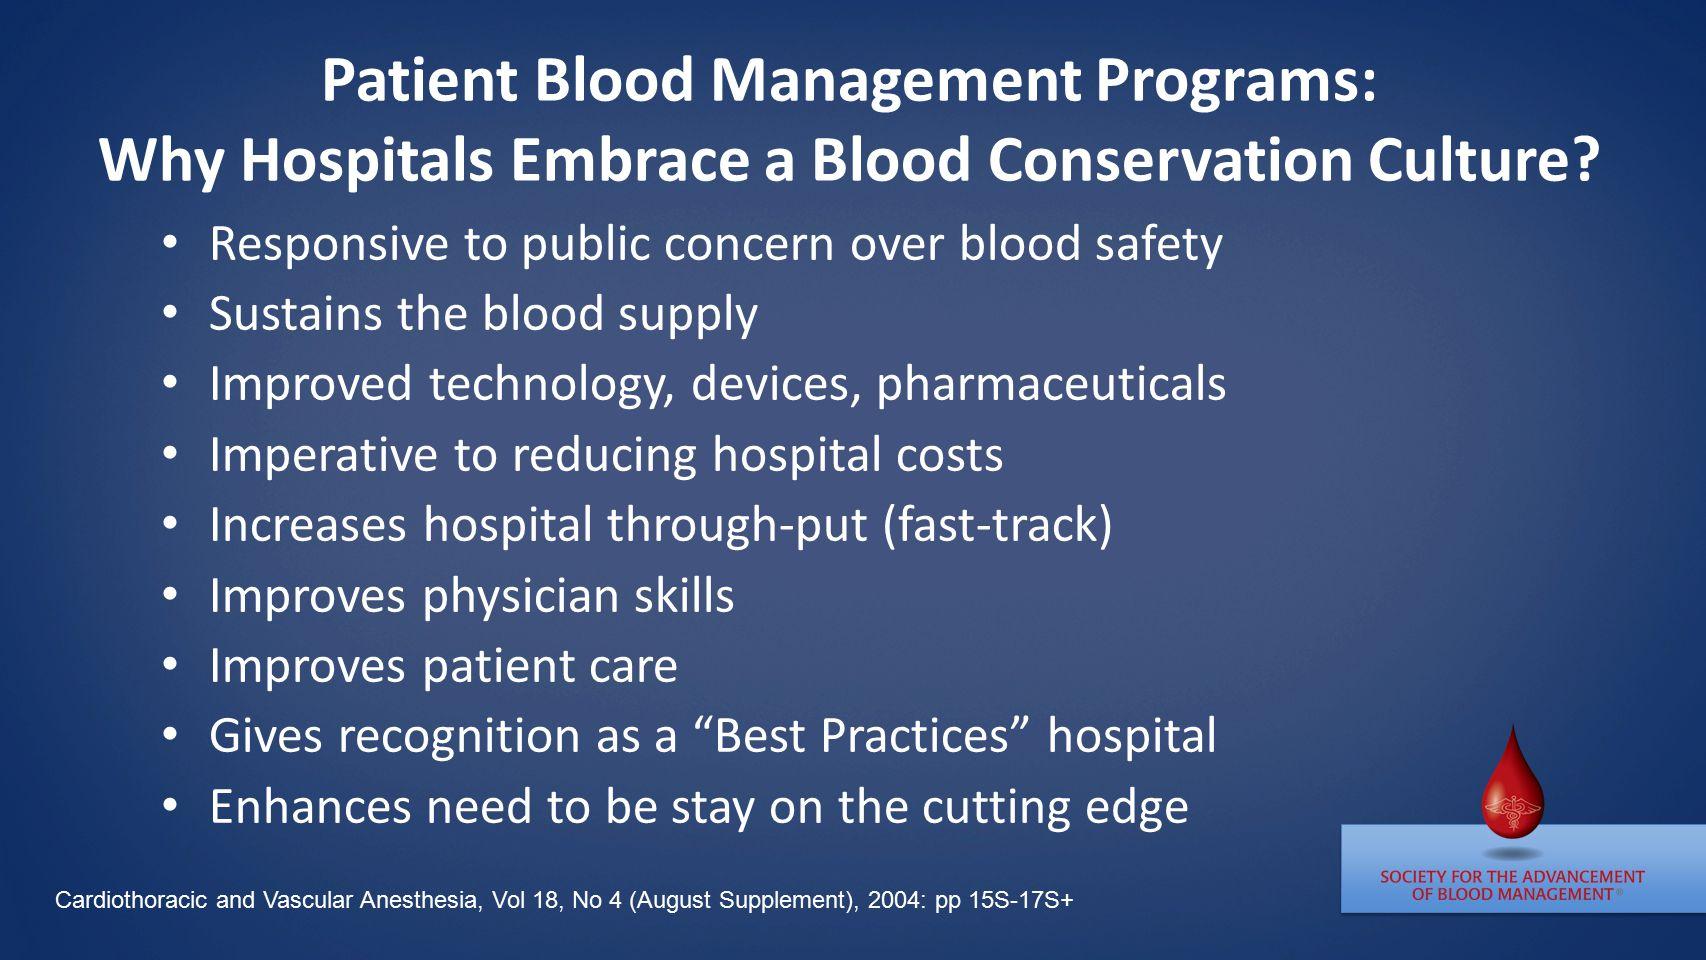 Patient Blood Management Programs: Why Hospitals Embrace a Blood Conservation Culture.